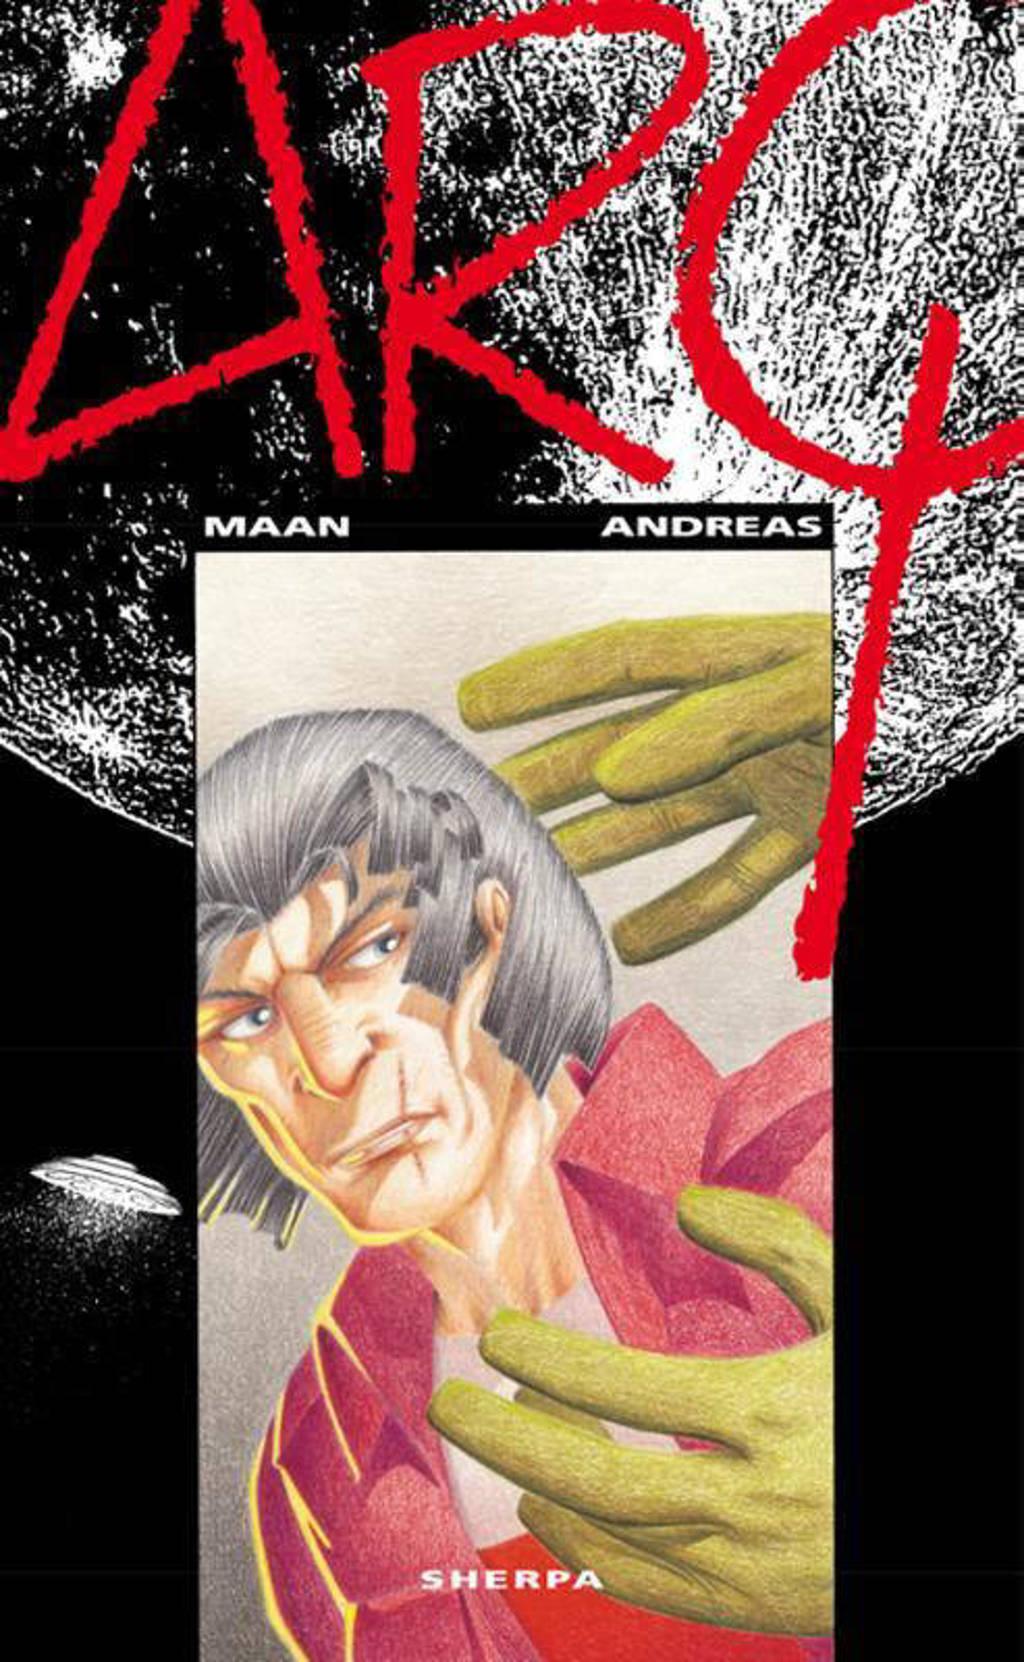 Arq: Maan - Andreas